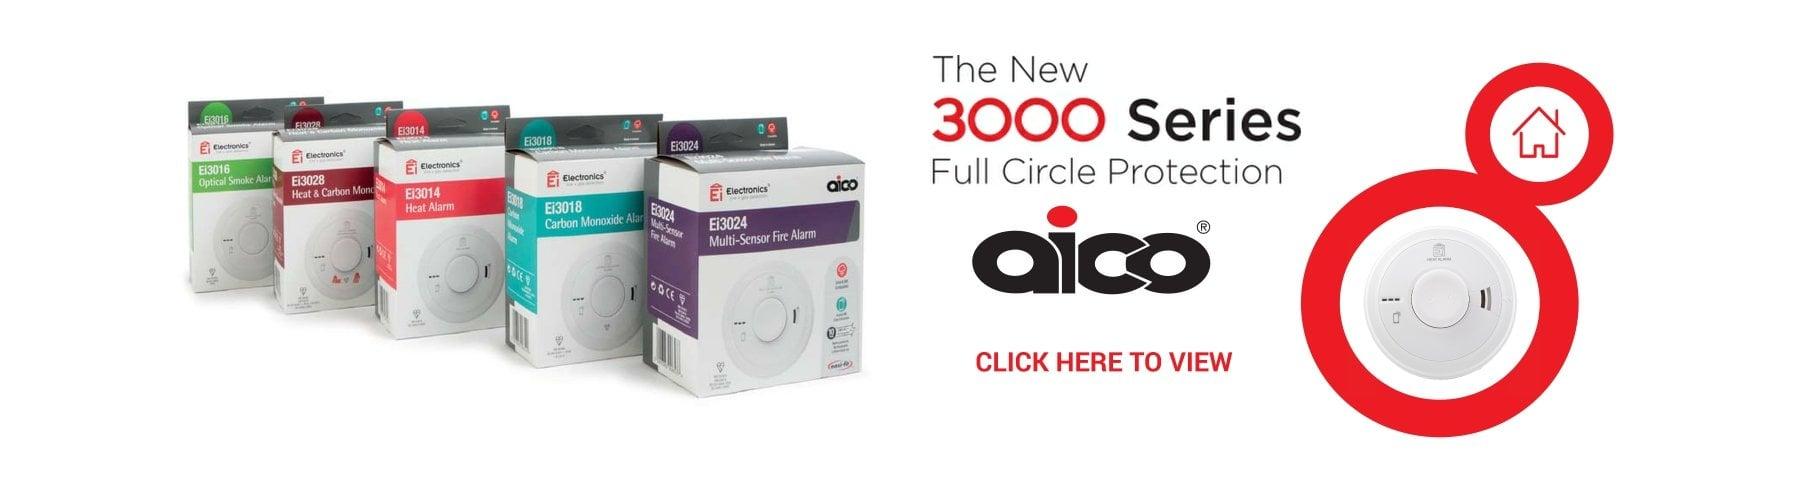 Aico 3000 series